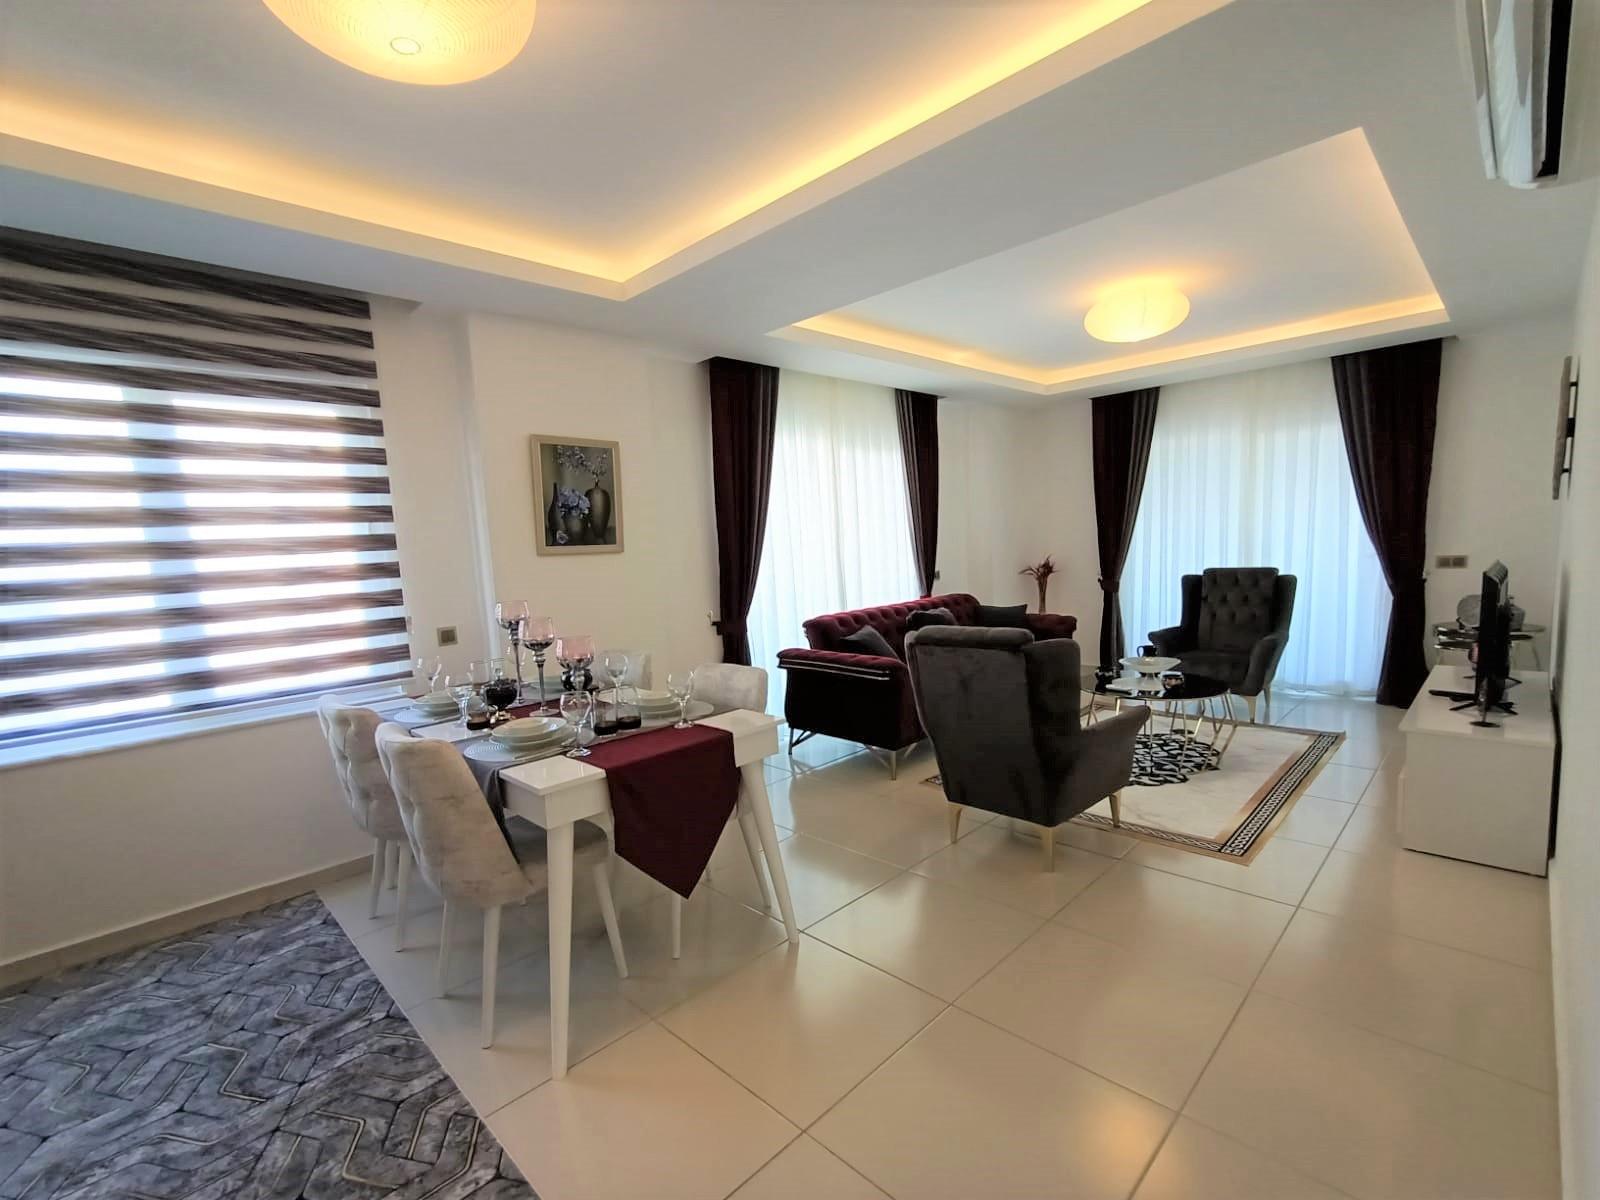 Двухкомнатная квартира с мебелью в районе Махмутлар - Фото 5